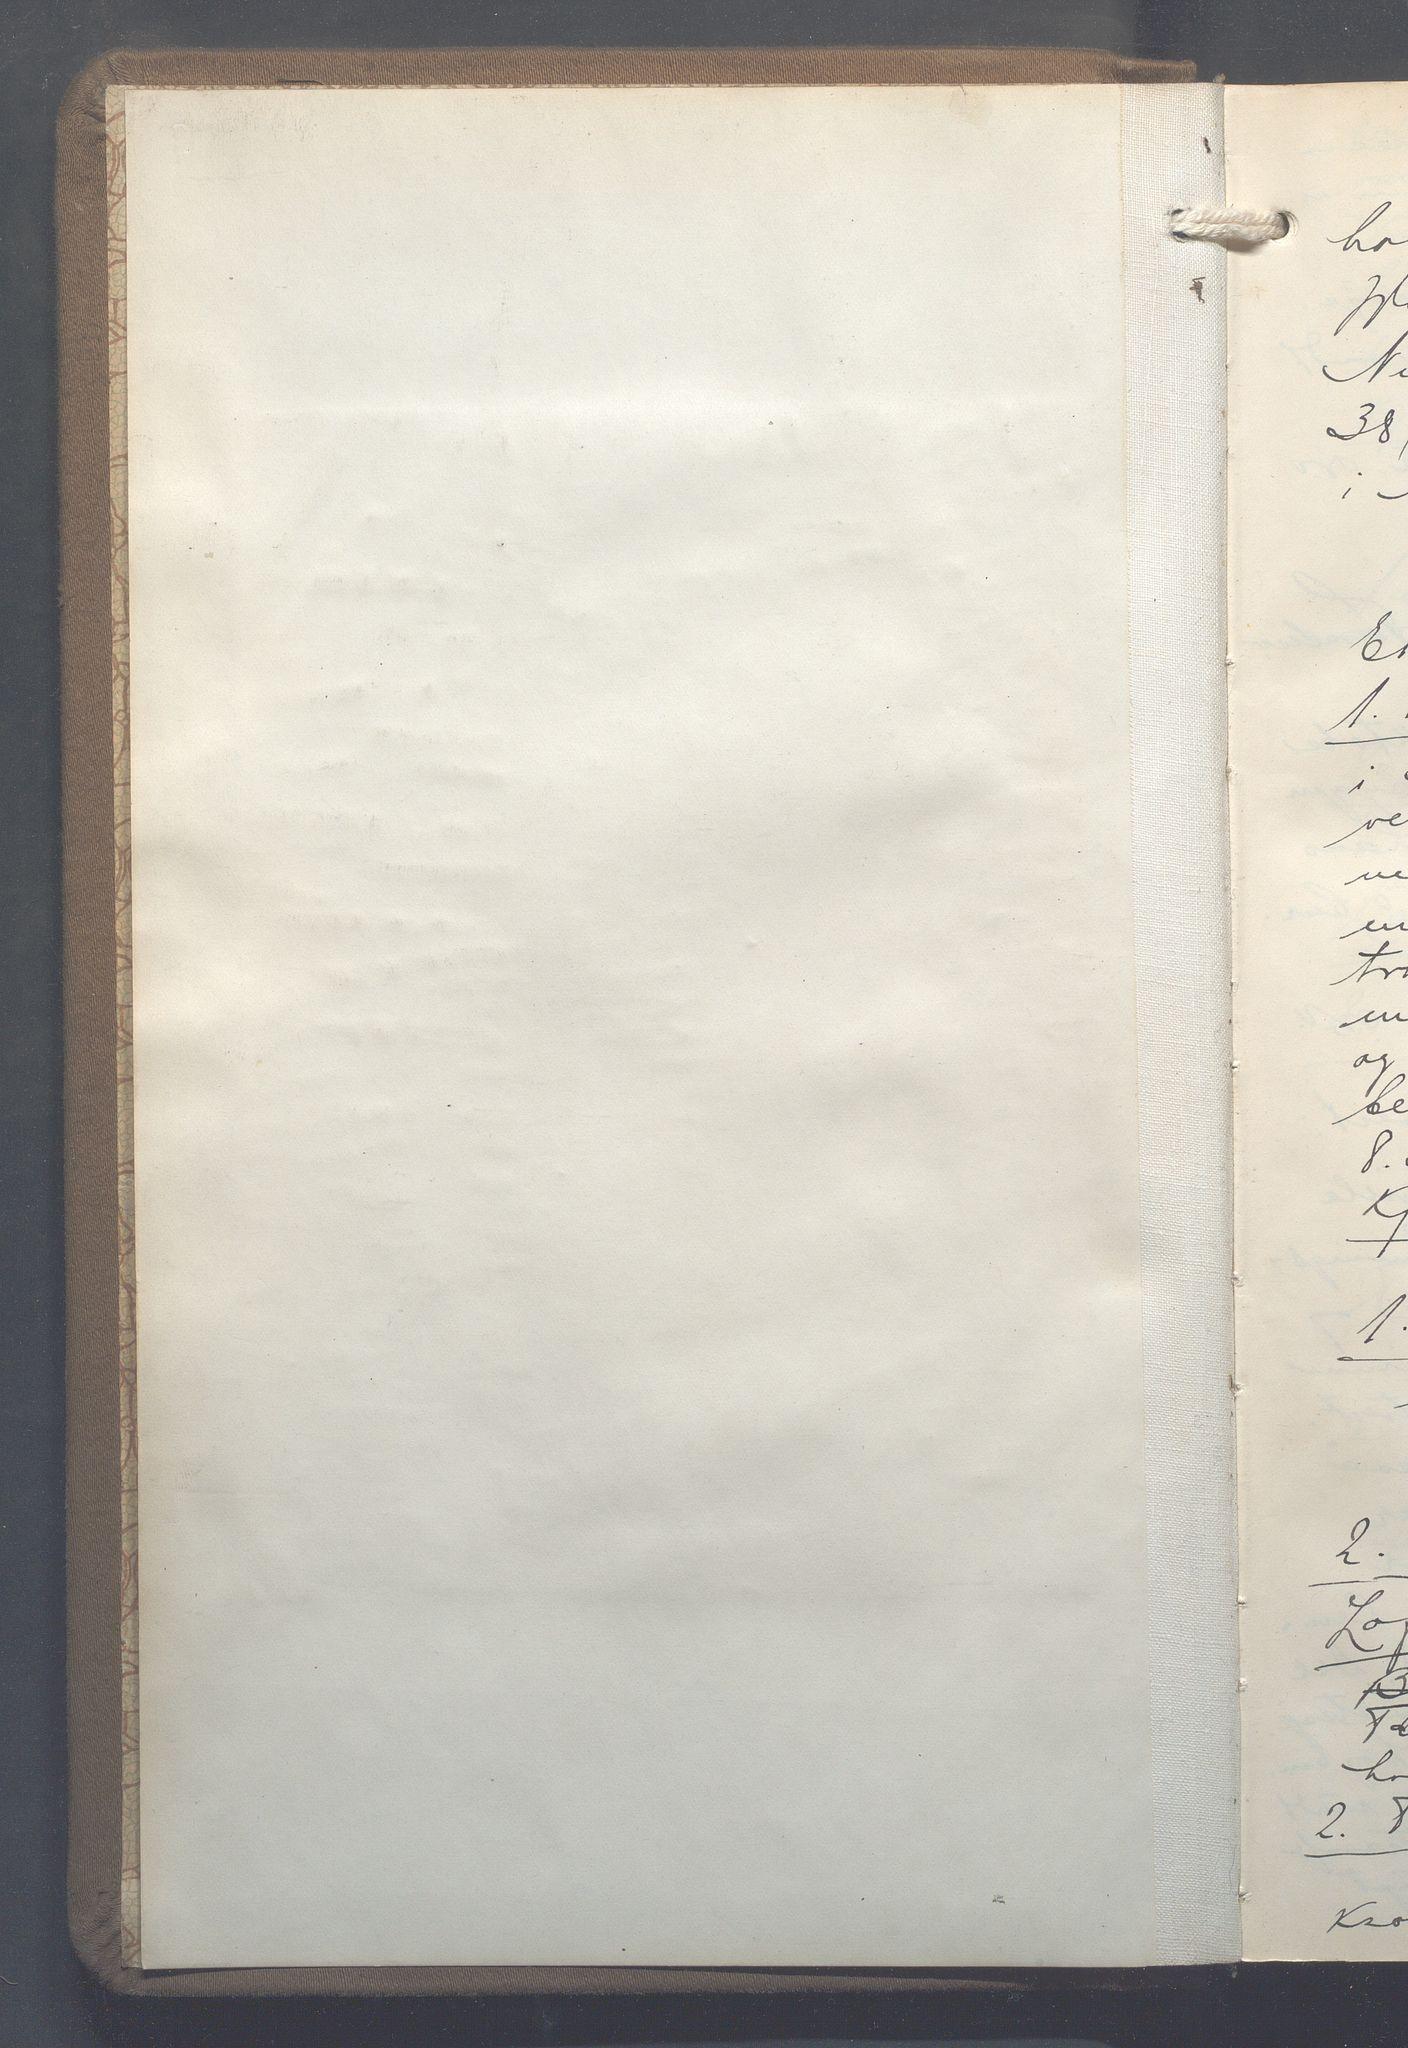 OBA, Lensmennene i Aker, F/Fa/L0026: Branntakstprotokoll, 1935-1939